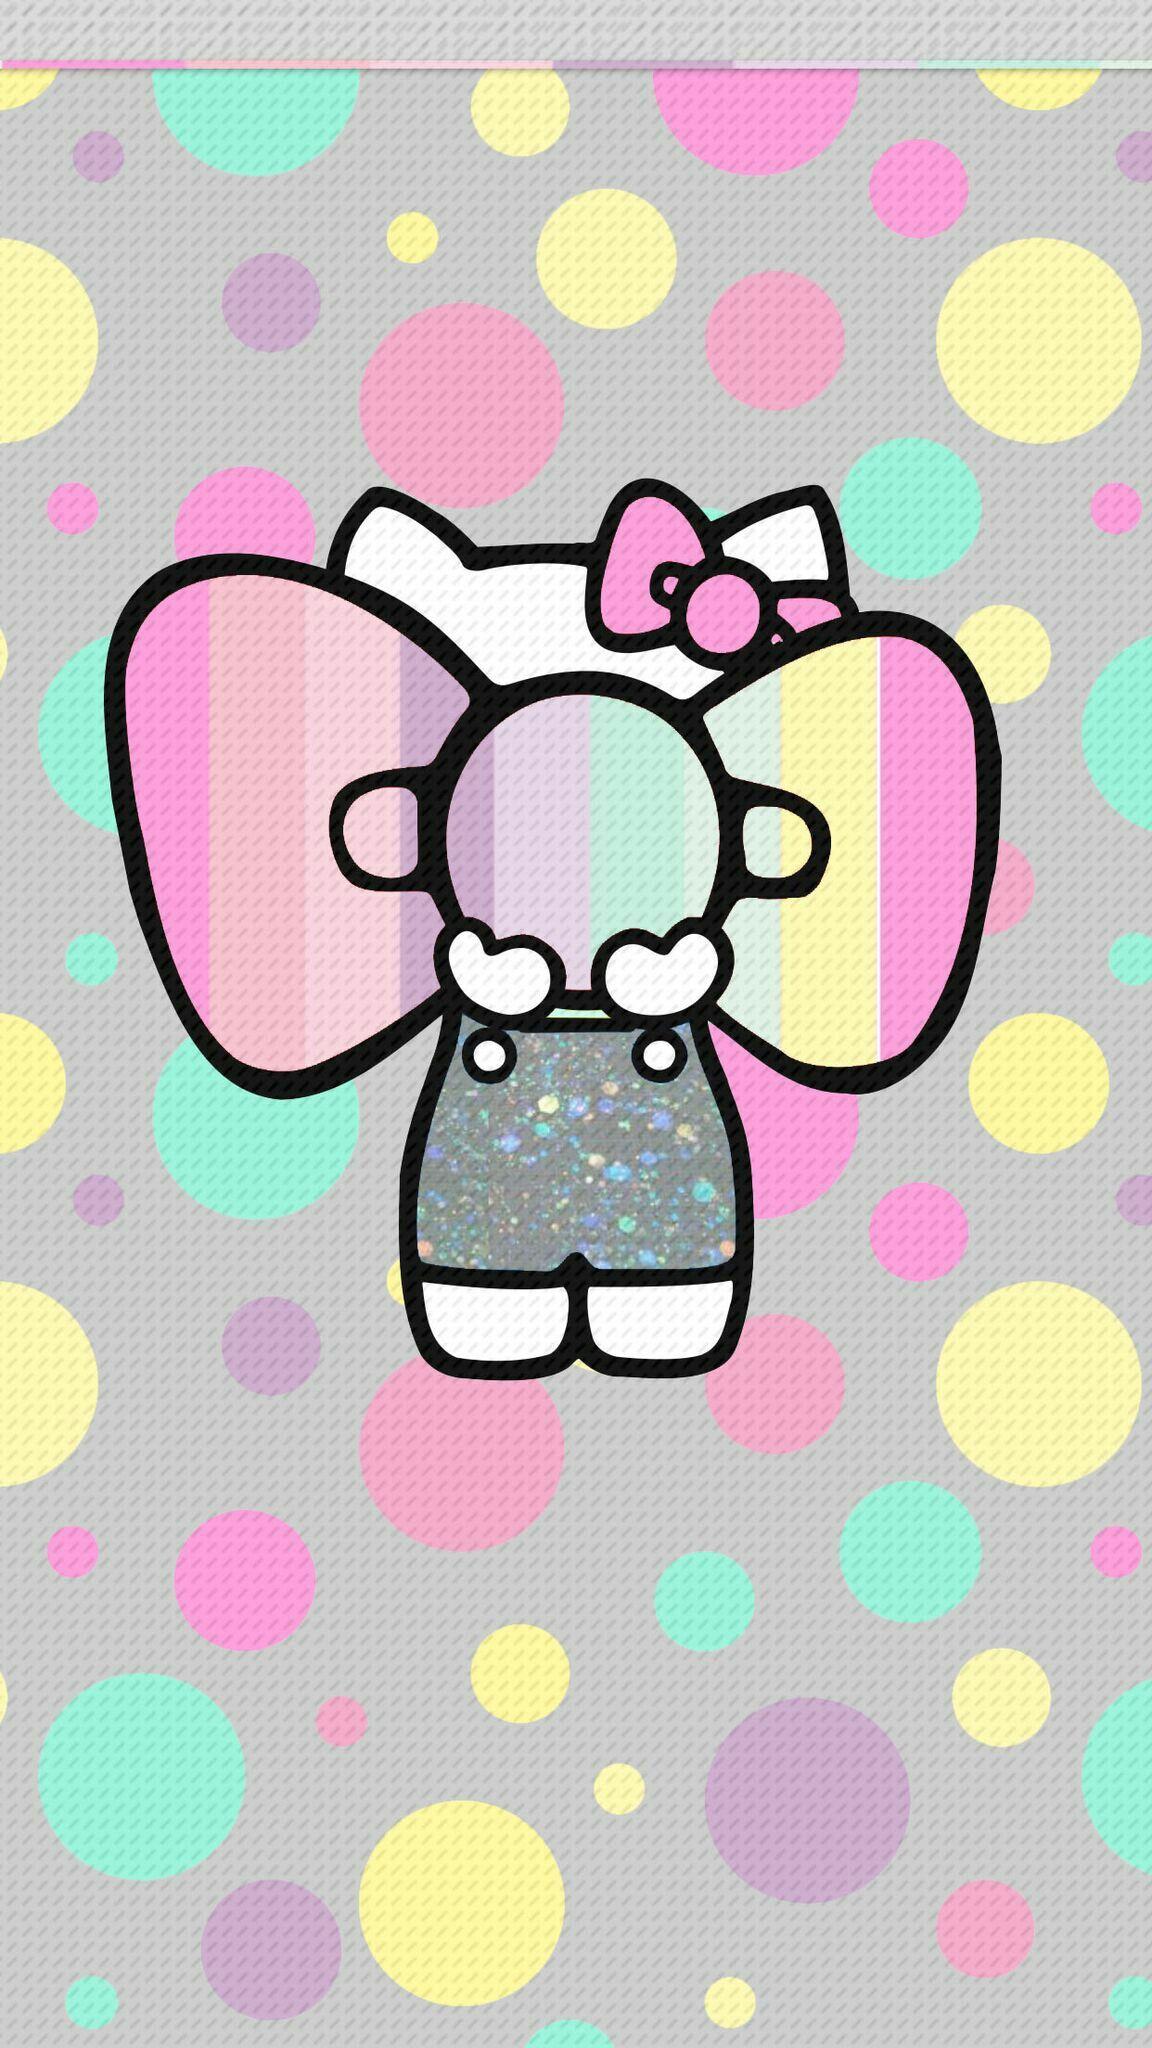 Pin by Susy Kosut on Hello Kitty Pinterest